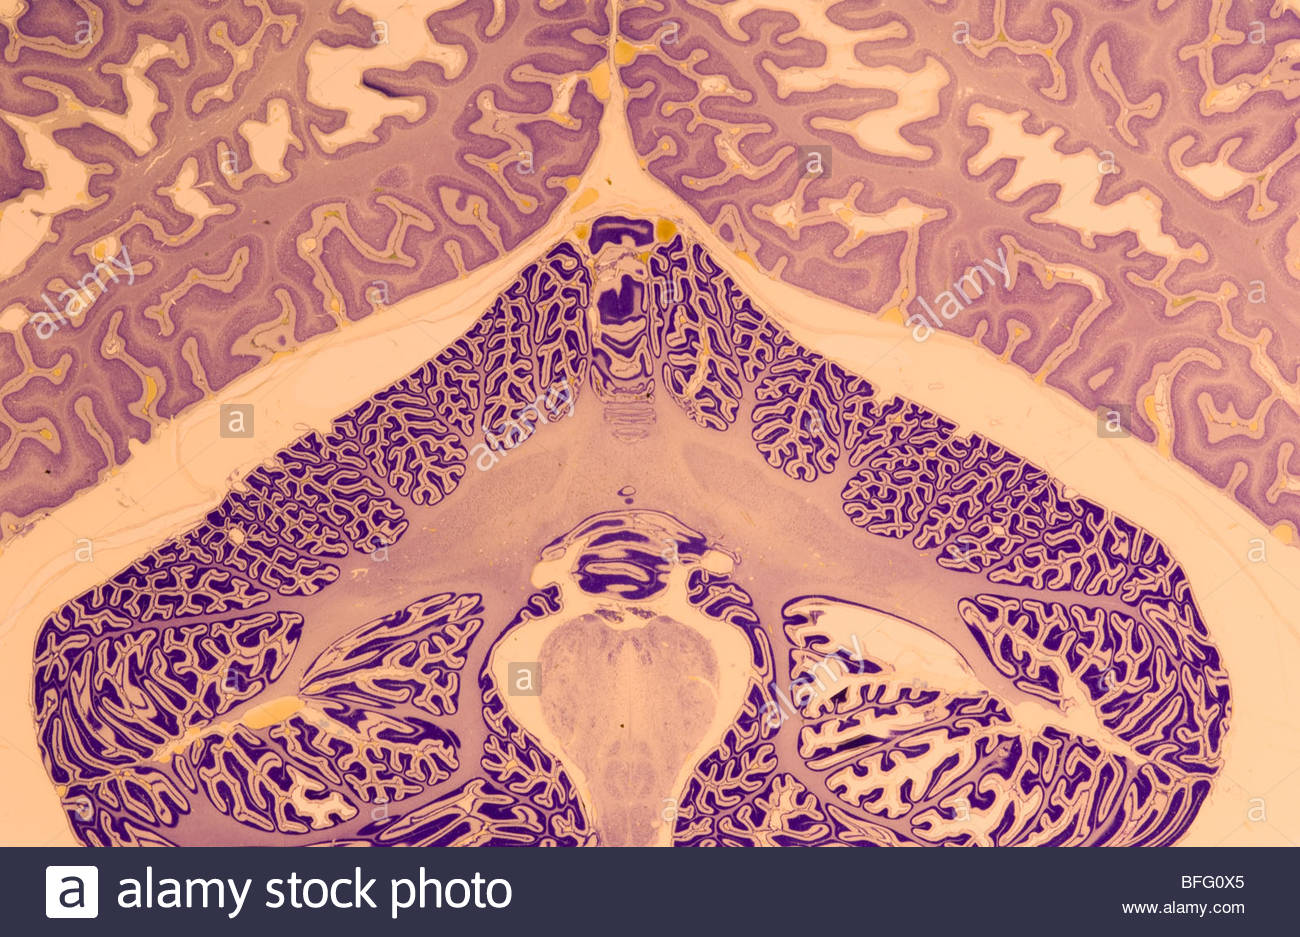 Human brain, National Medical Museum, Washington, D.C. - Stock Image